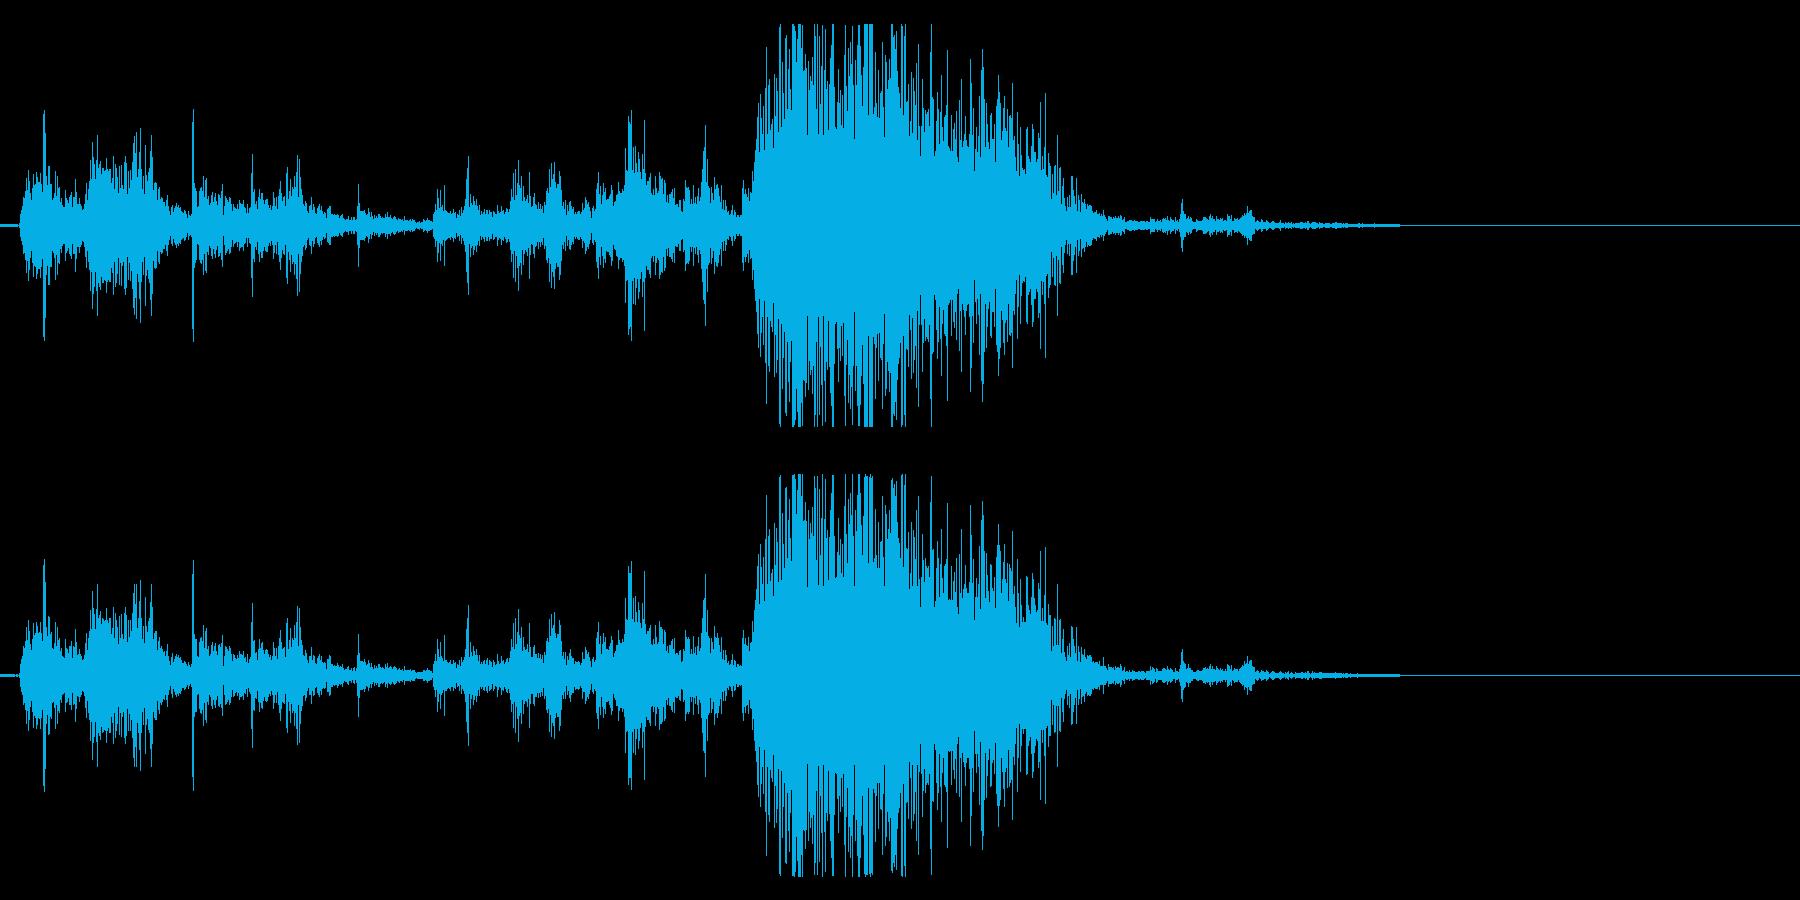 Zombie ゾンビが唸り飛びかかる音1の再生済みの波形